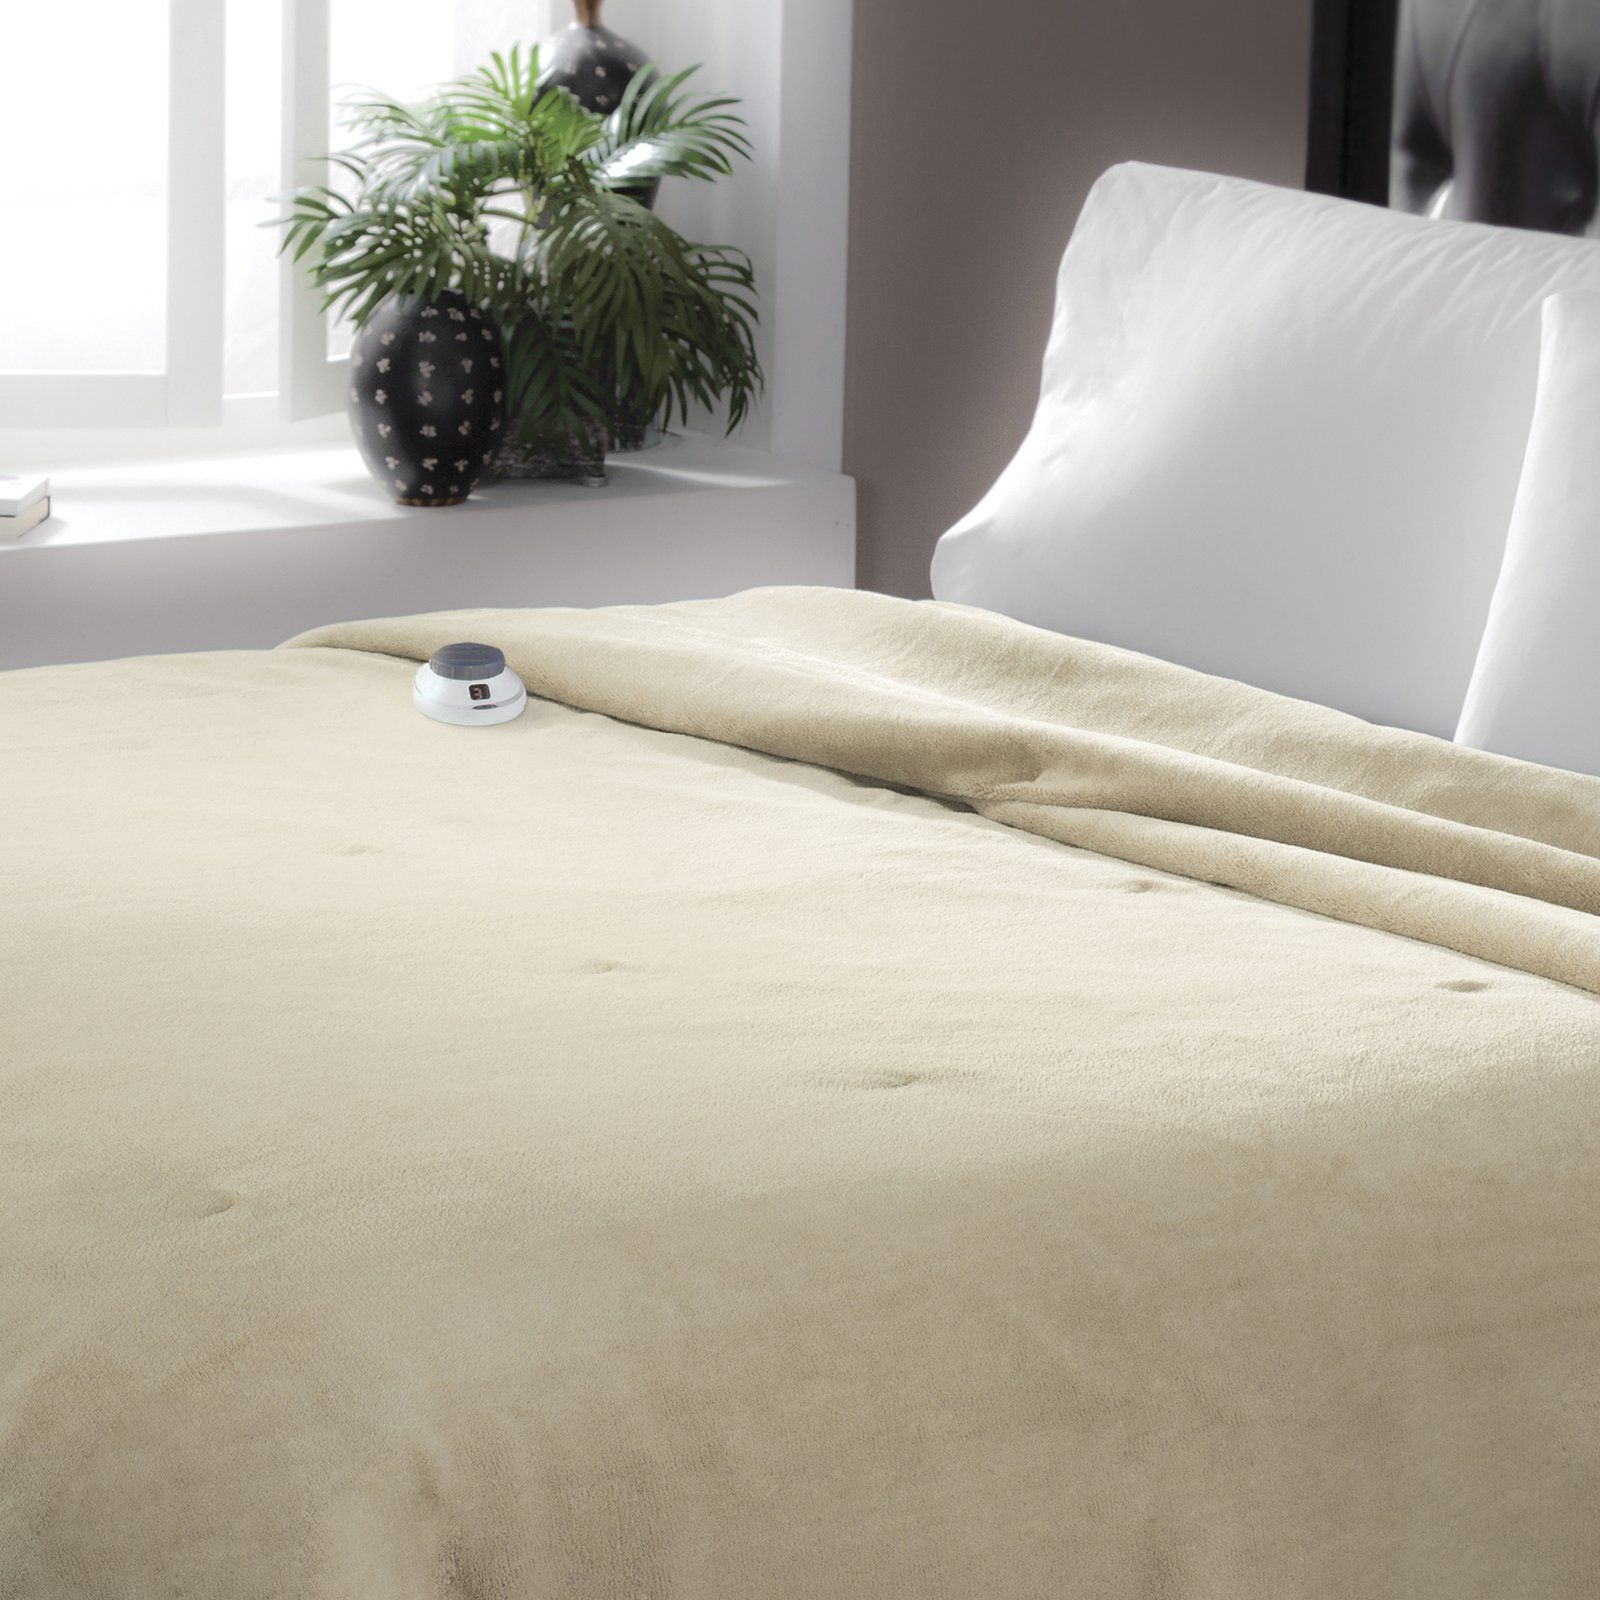 Serta Luxe Plush Electric Warming Blanket Heated Blanket